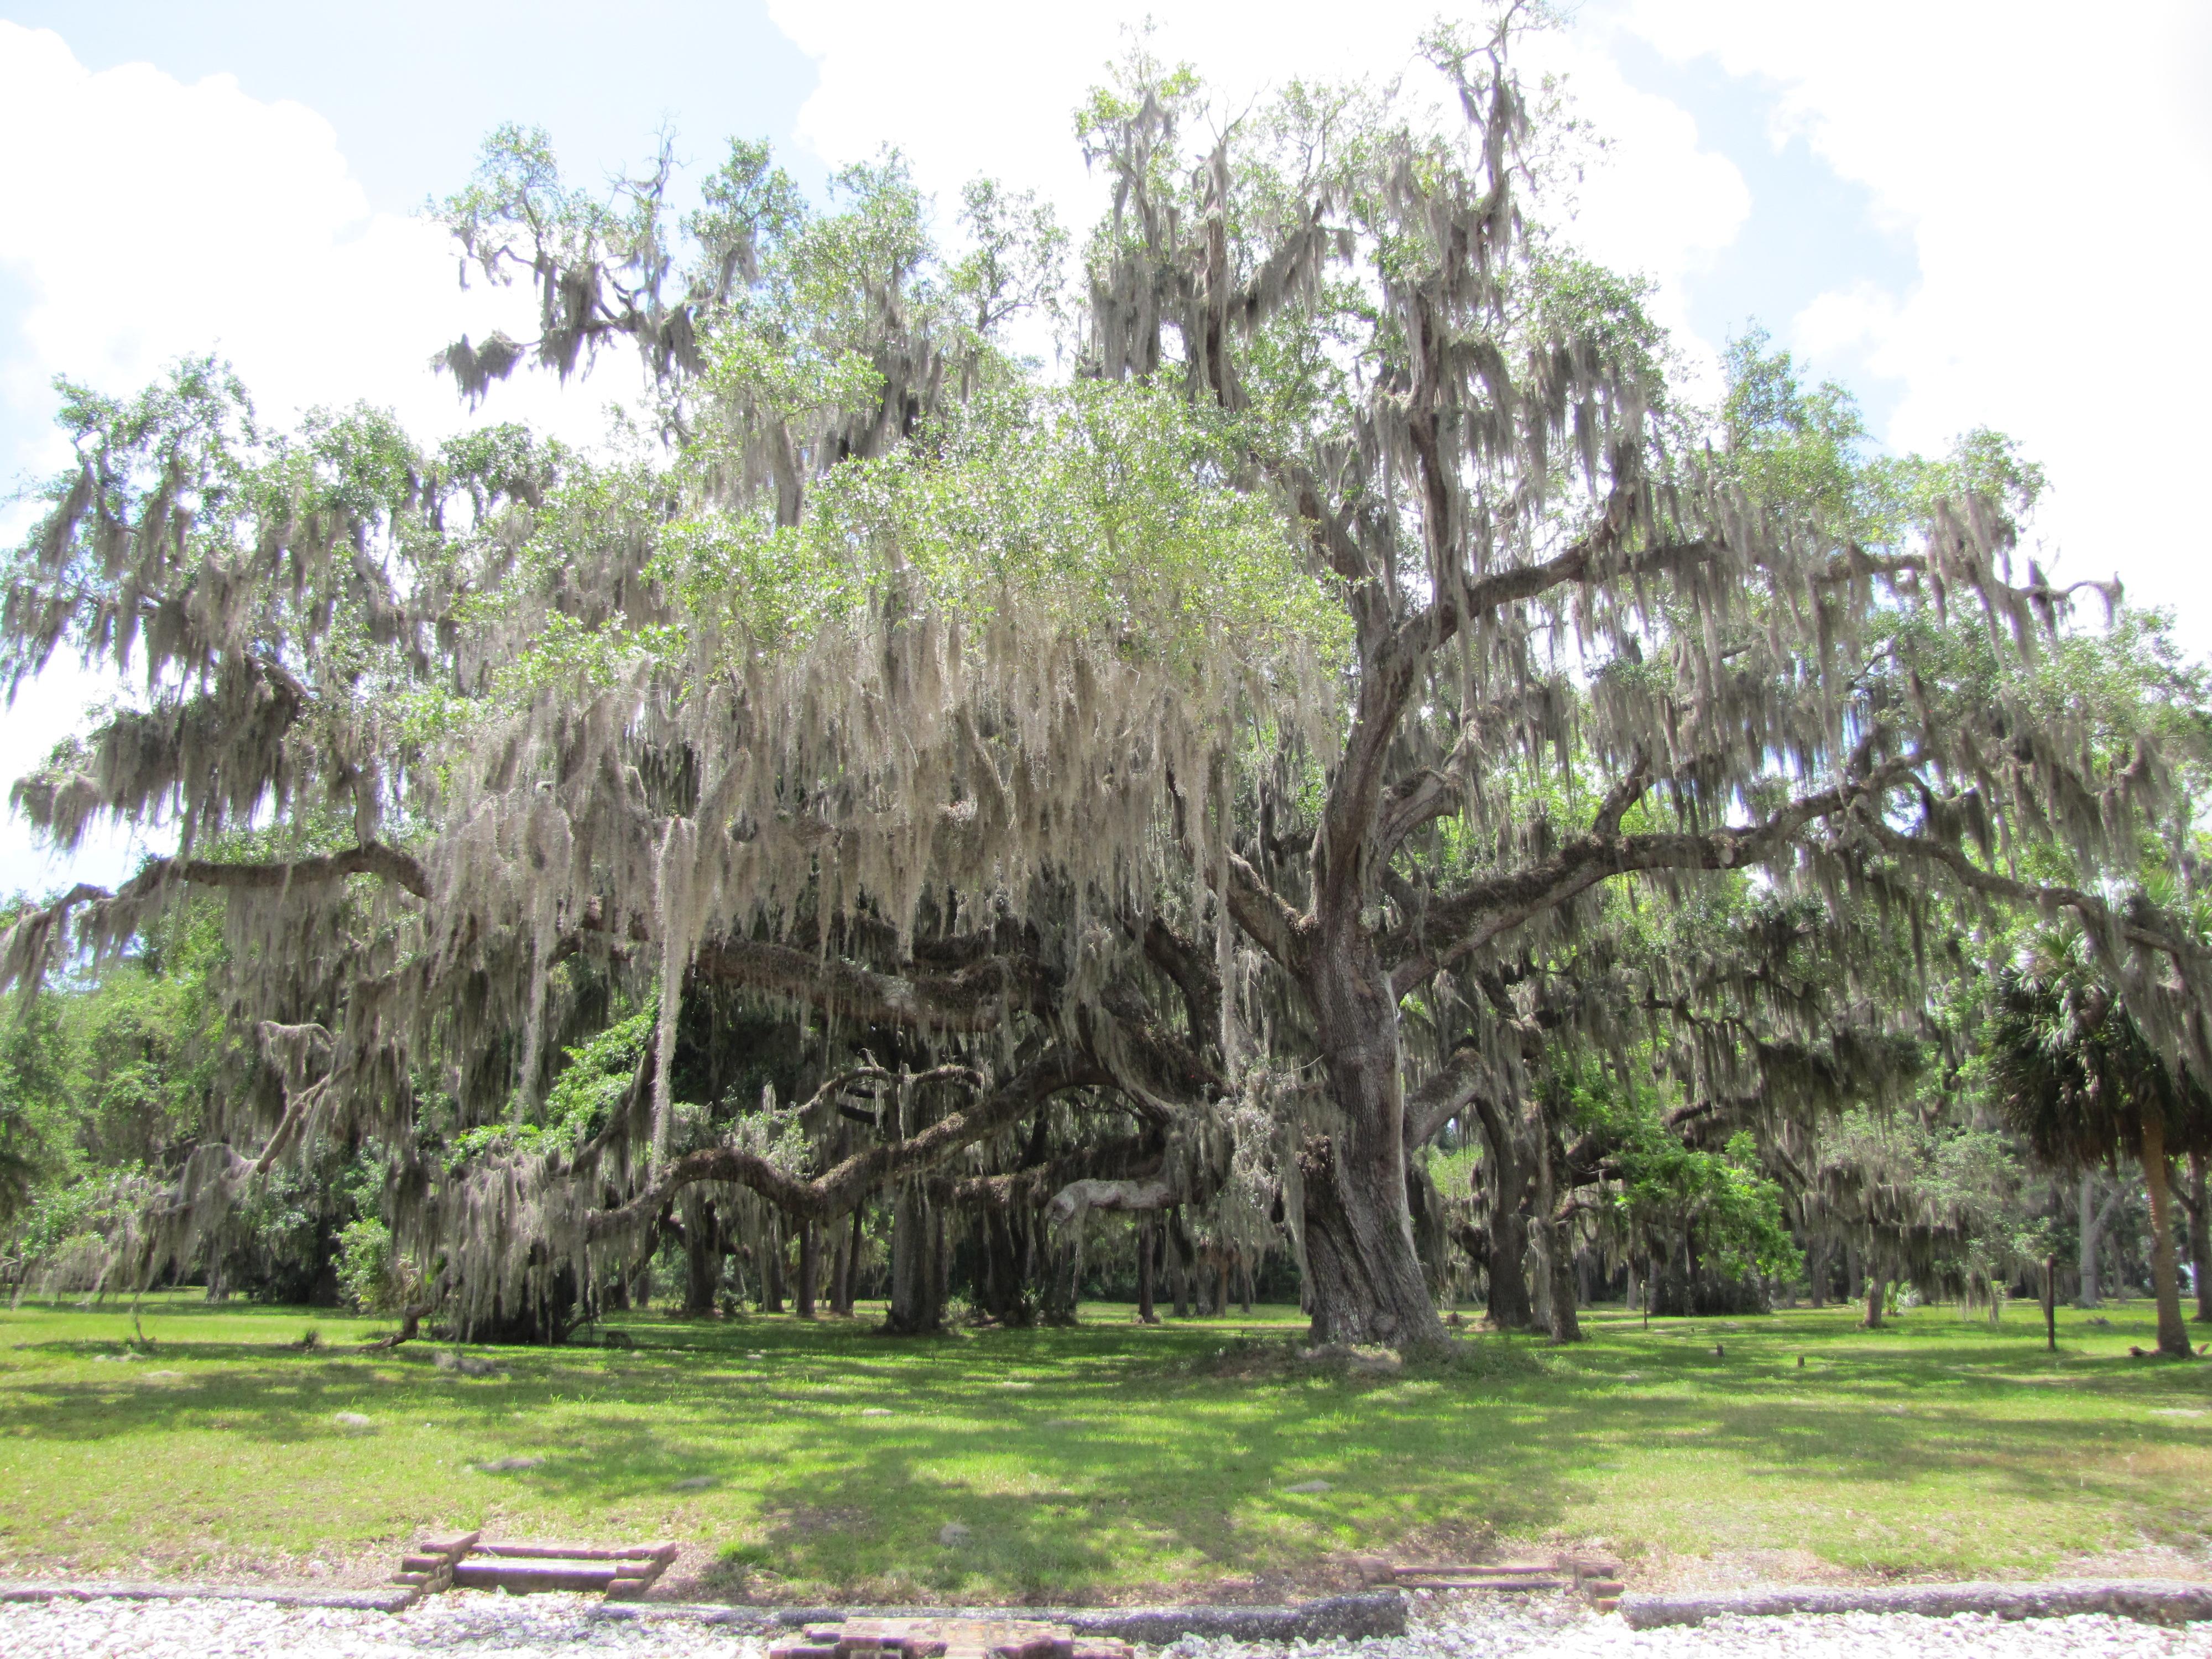 photograph of ancient oak